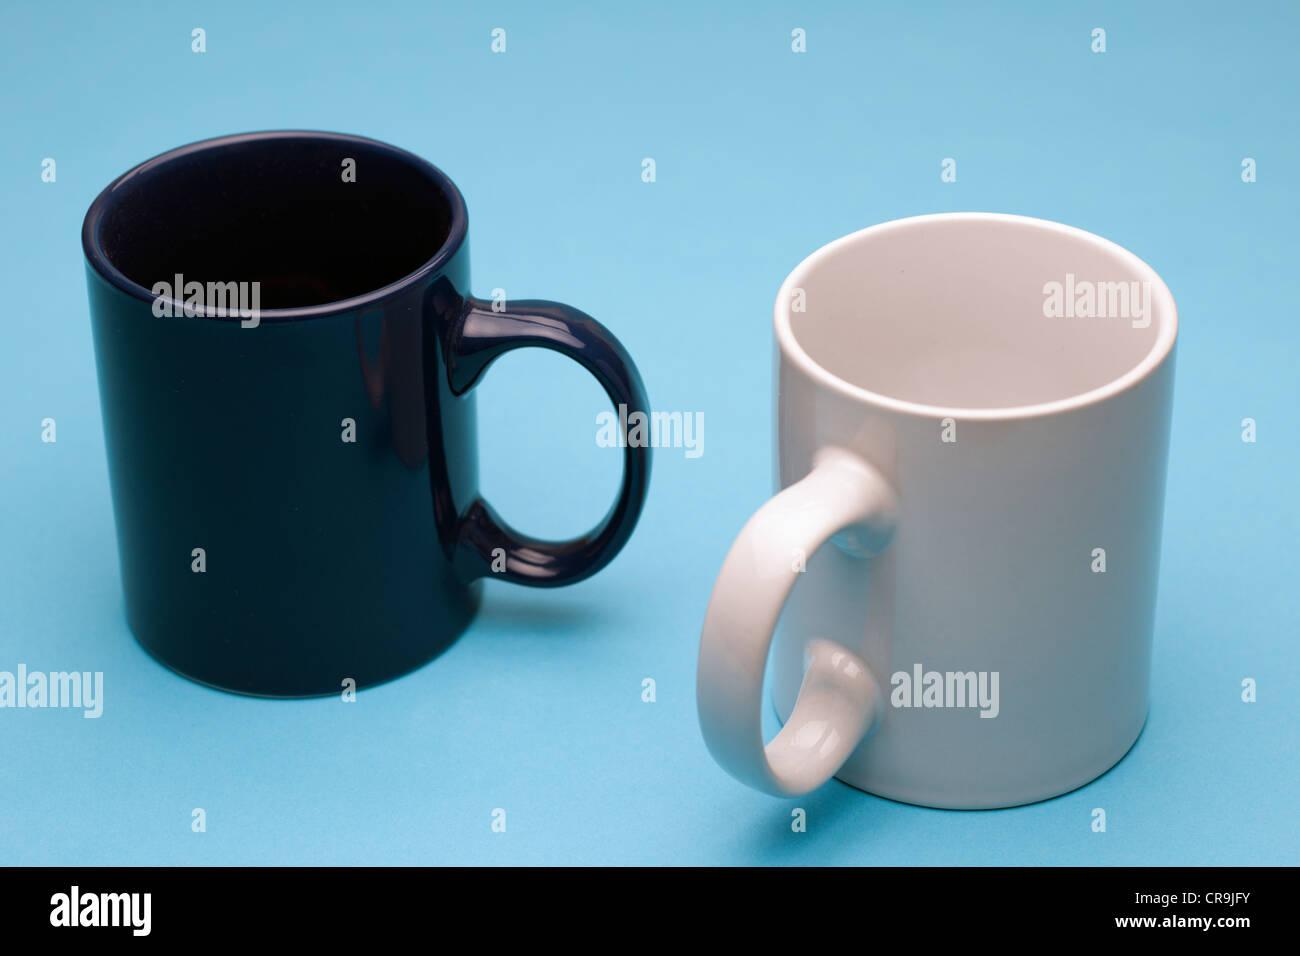 Two mugs - Stock Image